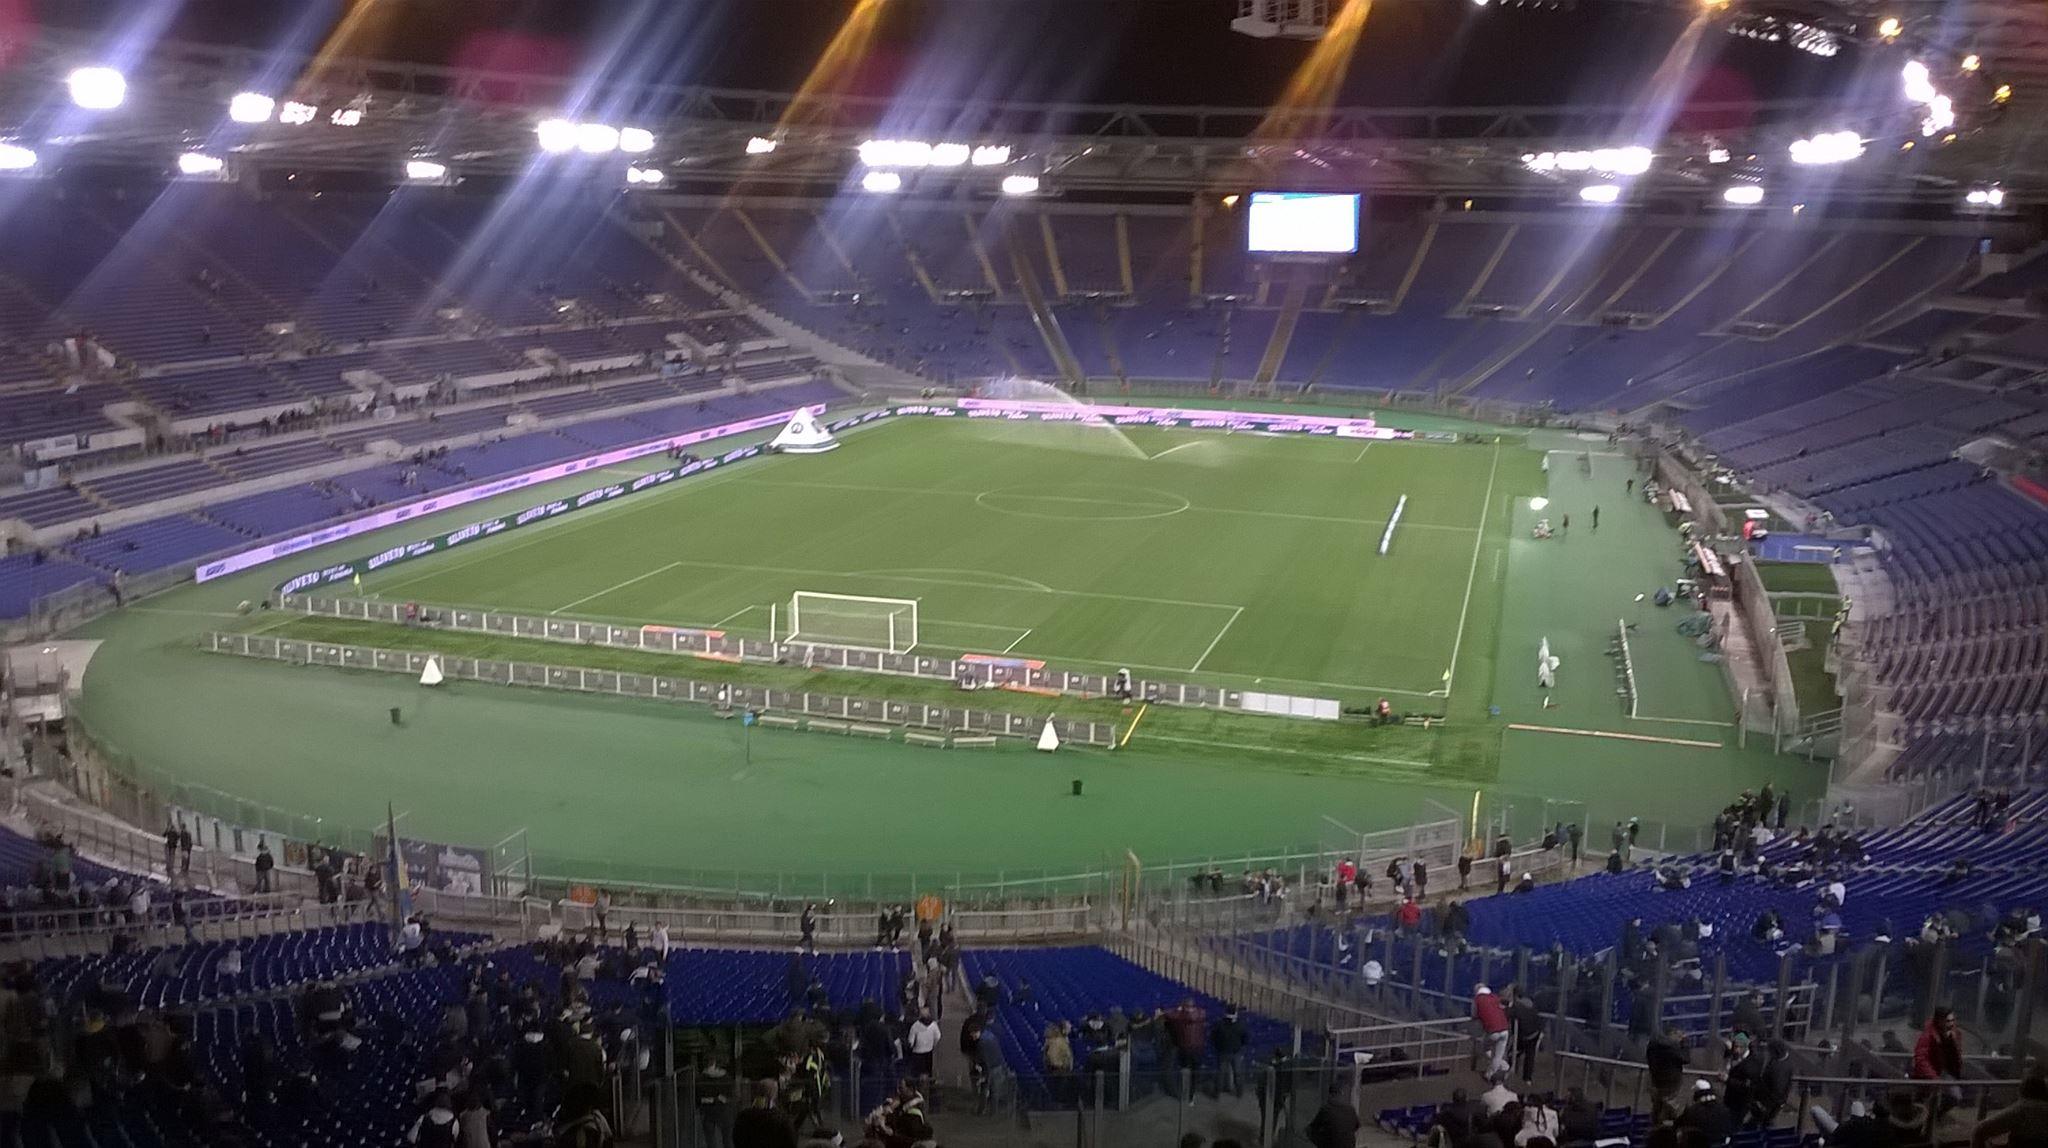 File:Stadio Olimpico (Rome).png - Wikimedia Commons